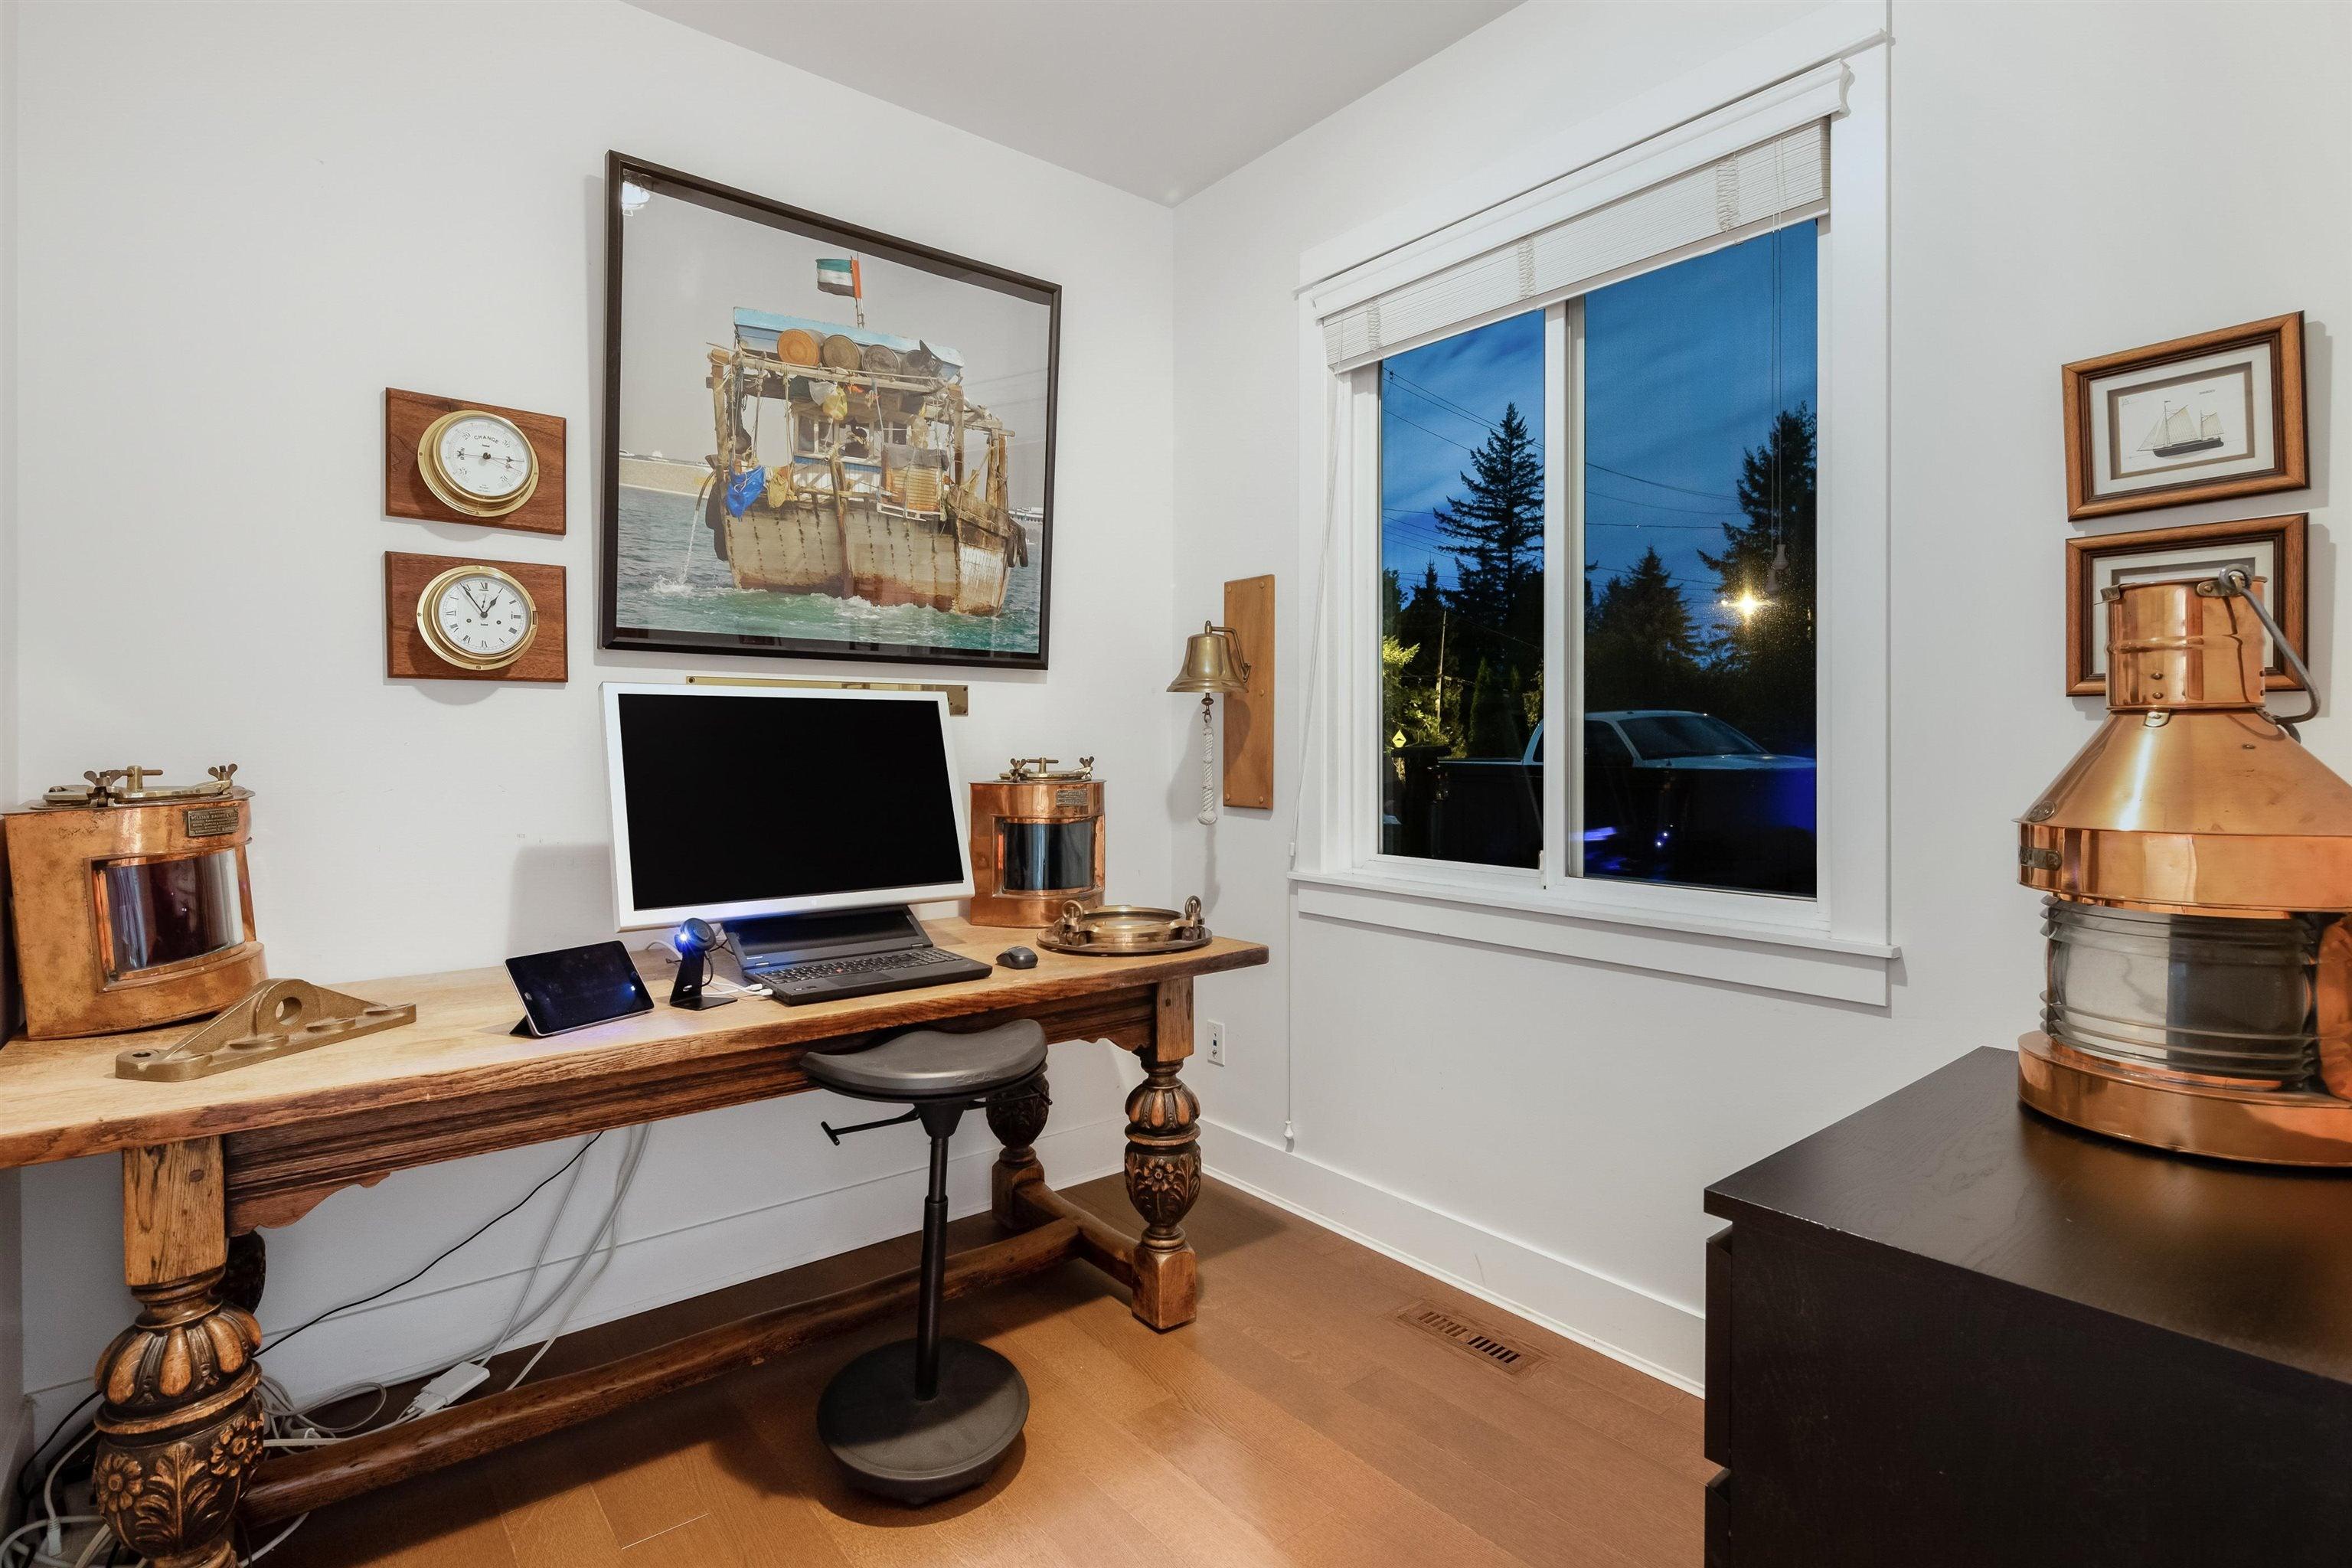 2258 WINDRIDGE DRIVE - Seymour NV House/Single Family for sale, 5 Bedrooms (R2617156) - #20